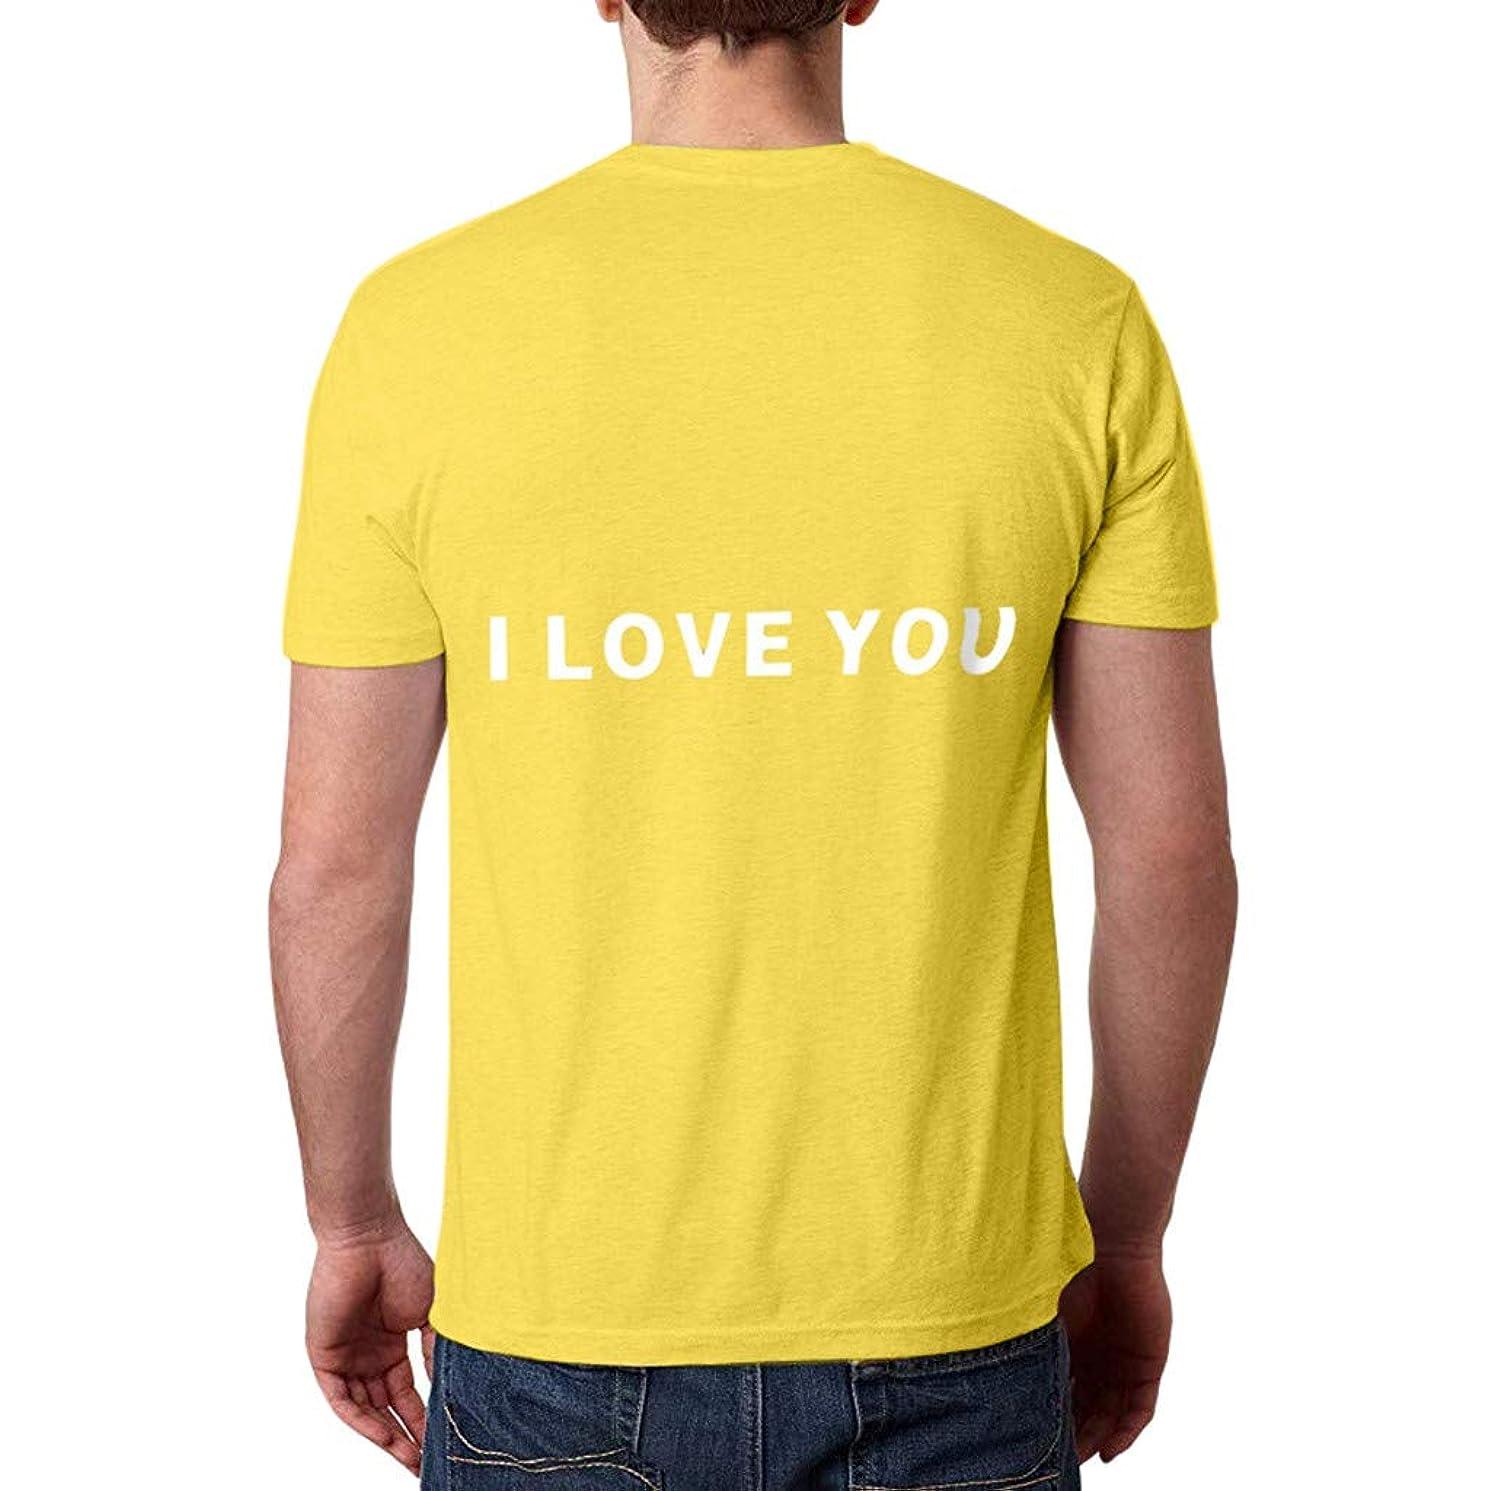 I Love You Three Thousand Times Thank You Fan End Game -Man Women Couple Minimalist Tees T-Shirt